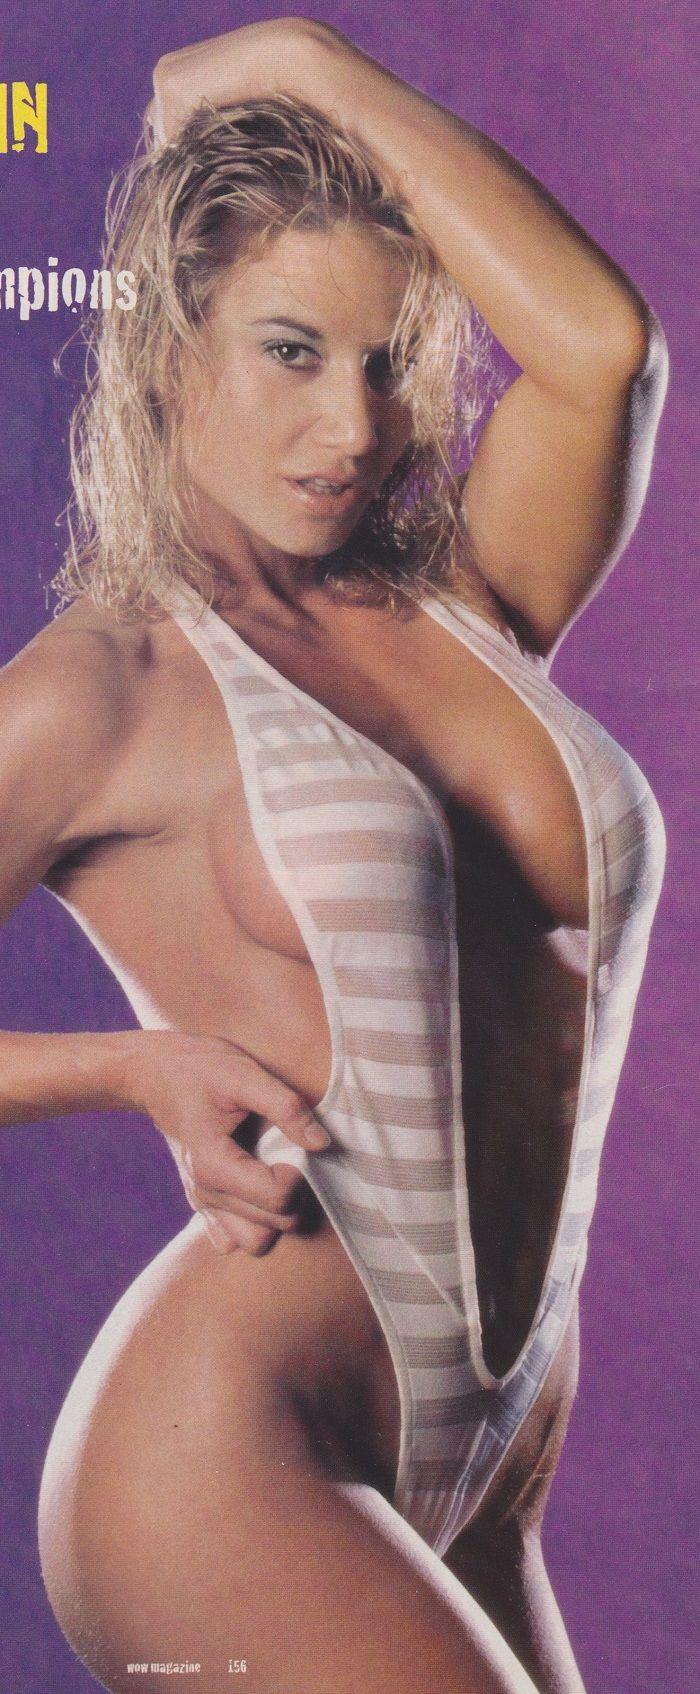 Hacked Myrna Fahey nudes (56 foto) Ass, iCloud, butt